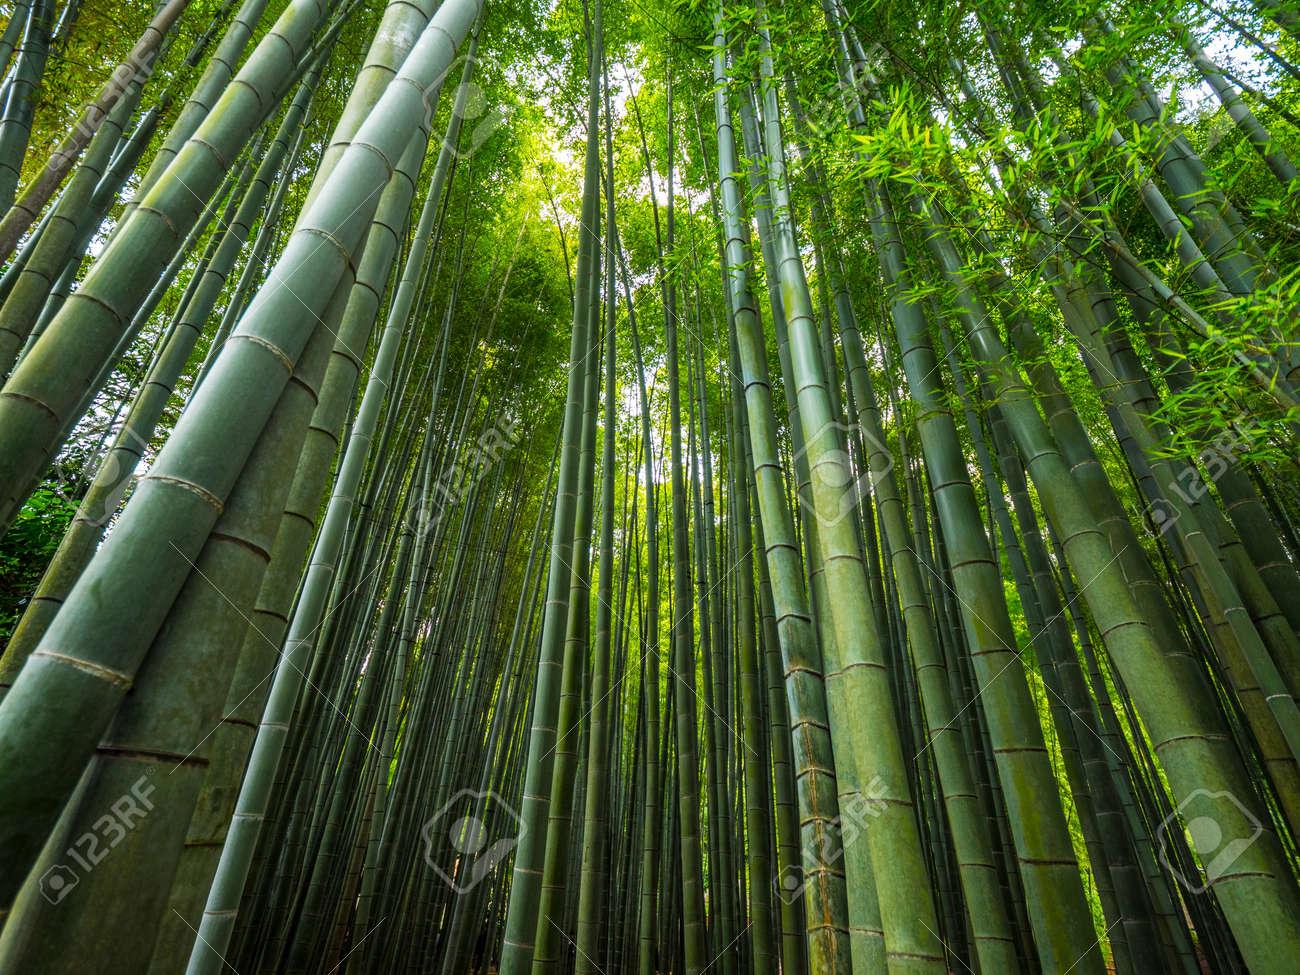 The Tall Bamboo Trees Of Kamakura A Wonderful Place Stock Photo